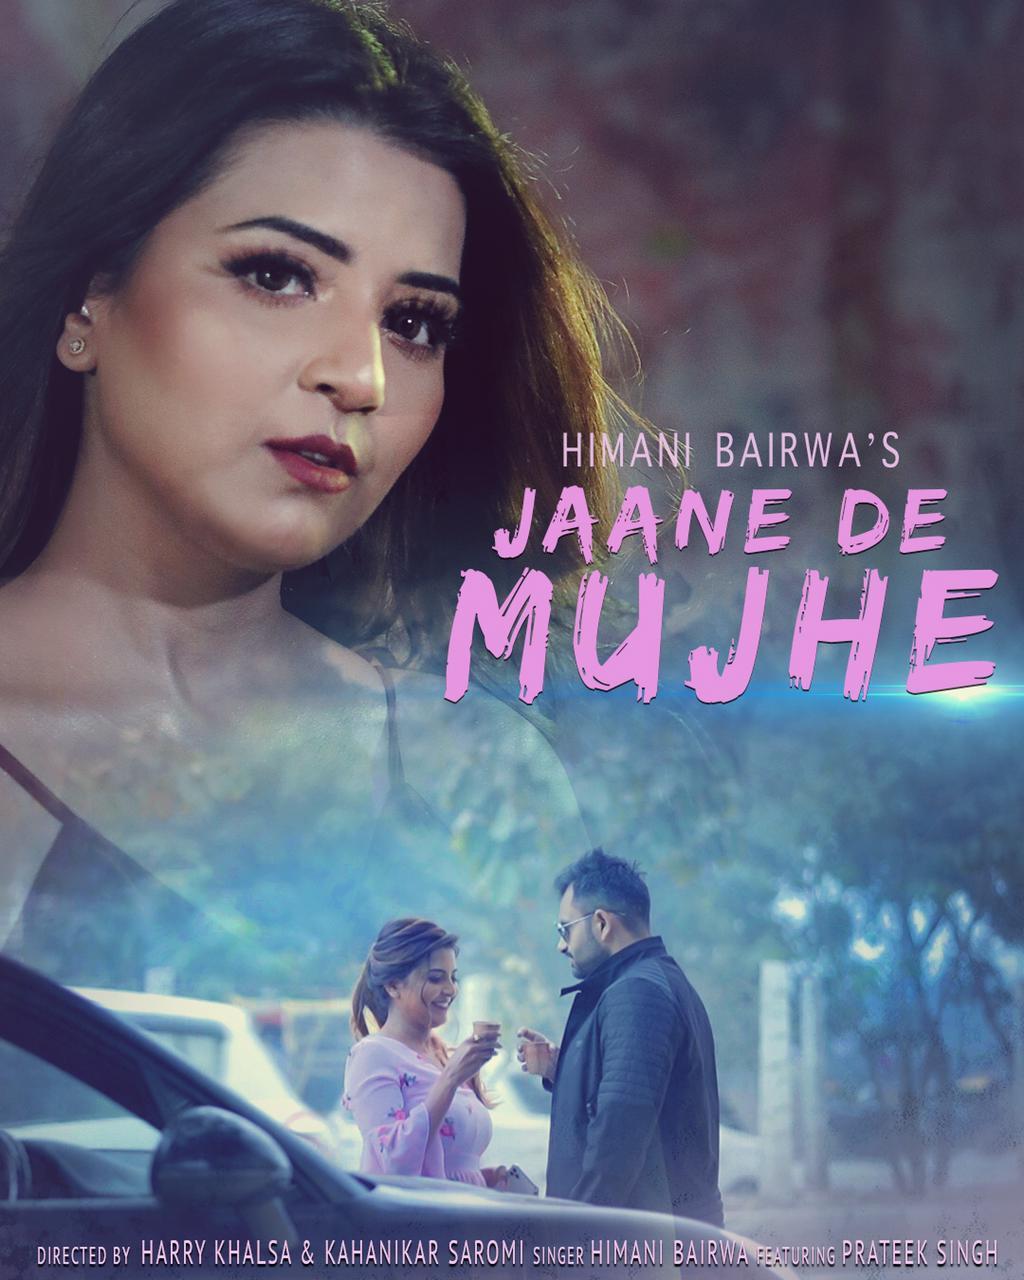 The-first-original-track-of-the-multitalented-singing-sensation-Himani-Bairwa-released-Jaane-De-Mujhe